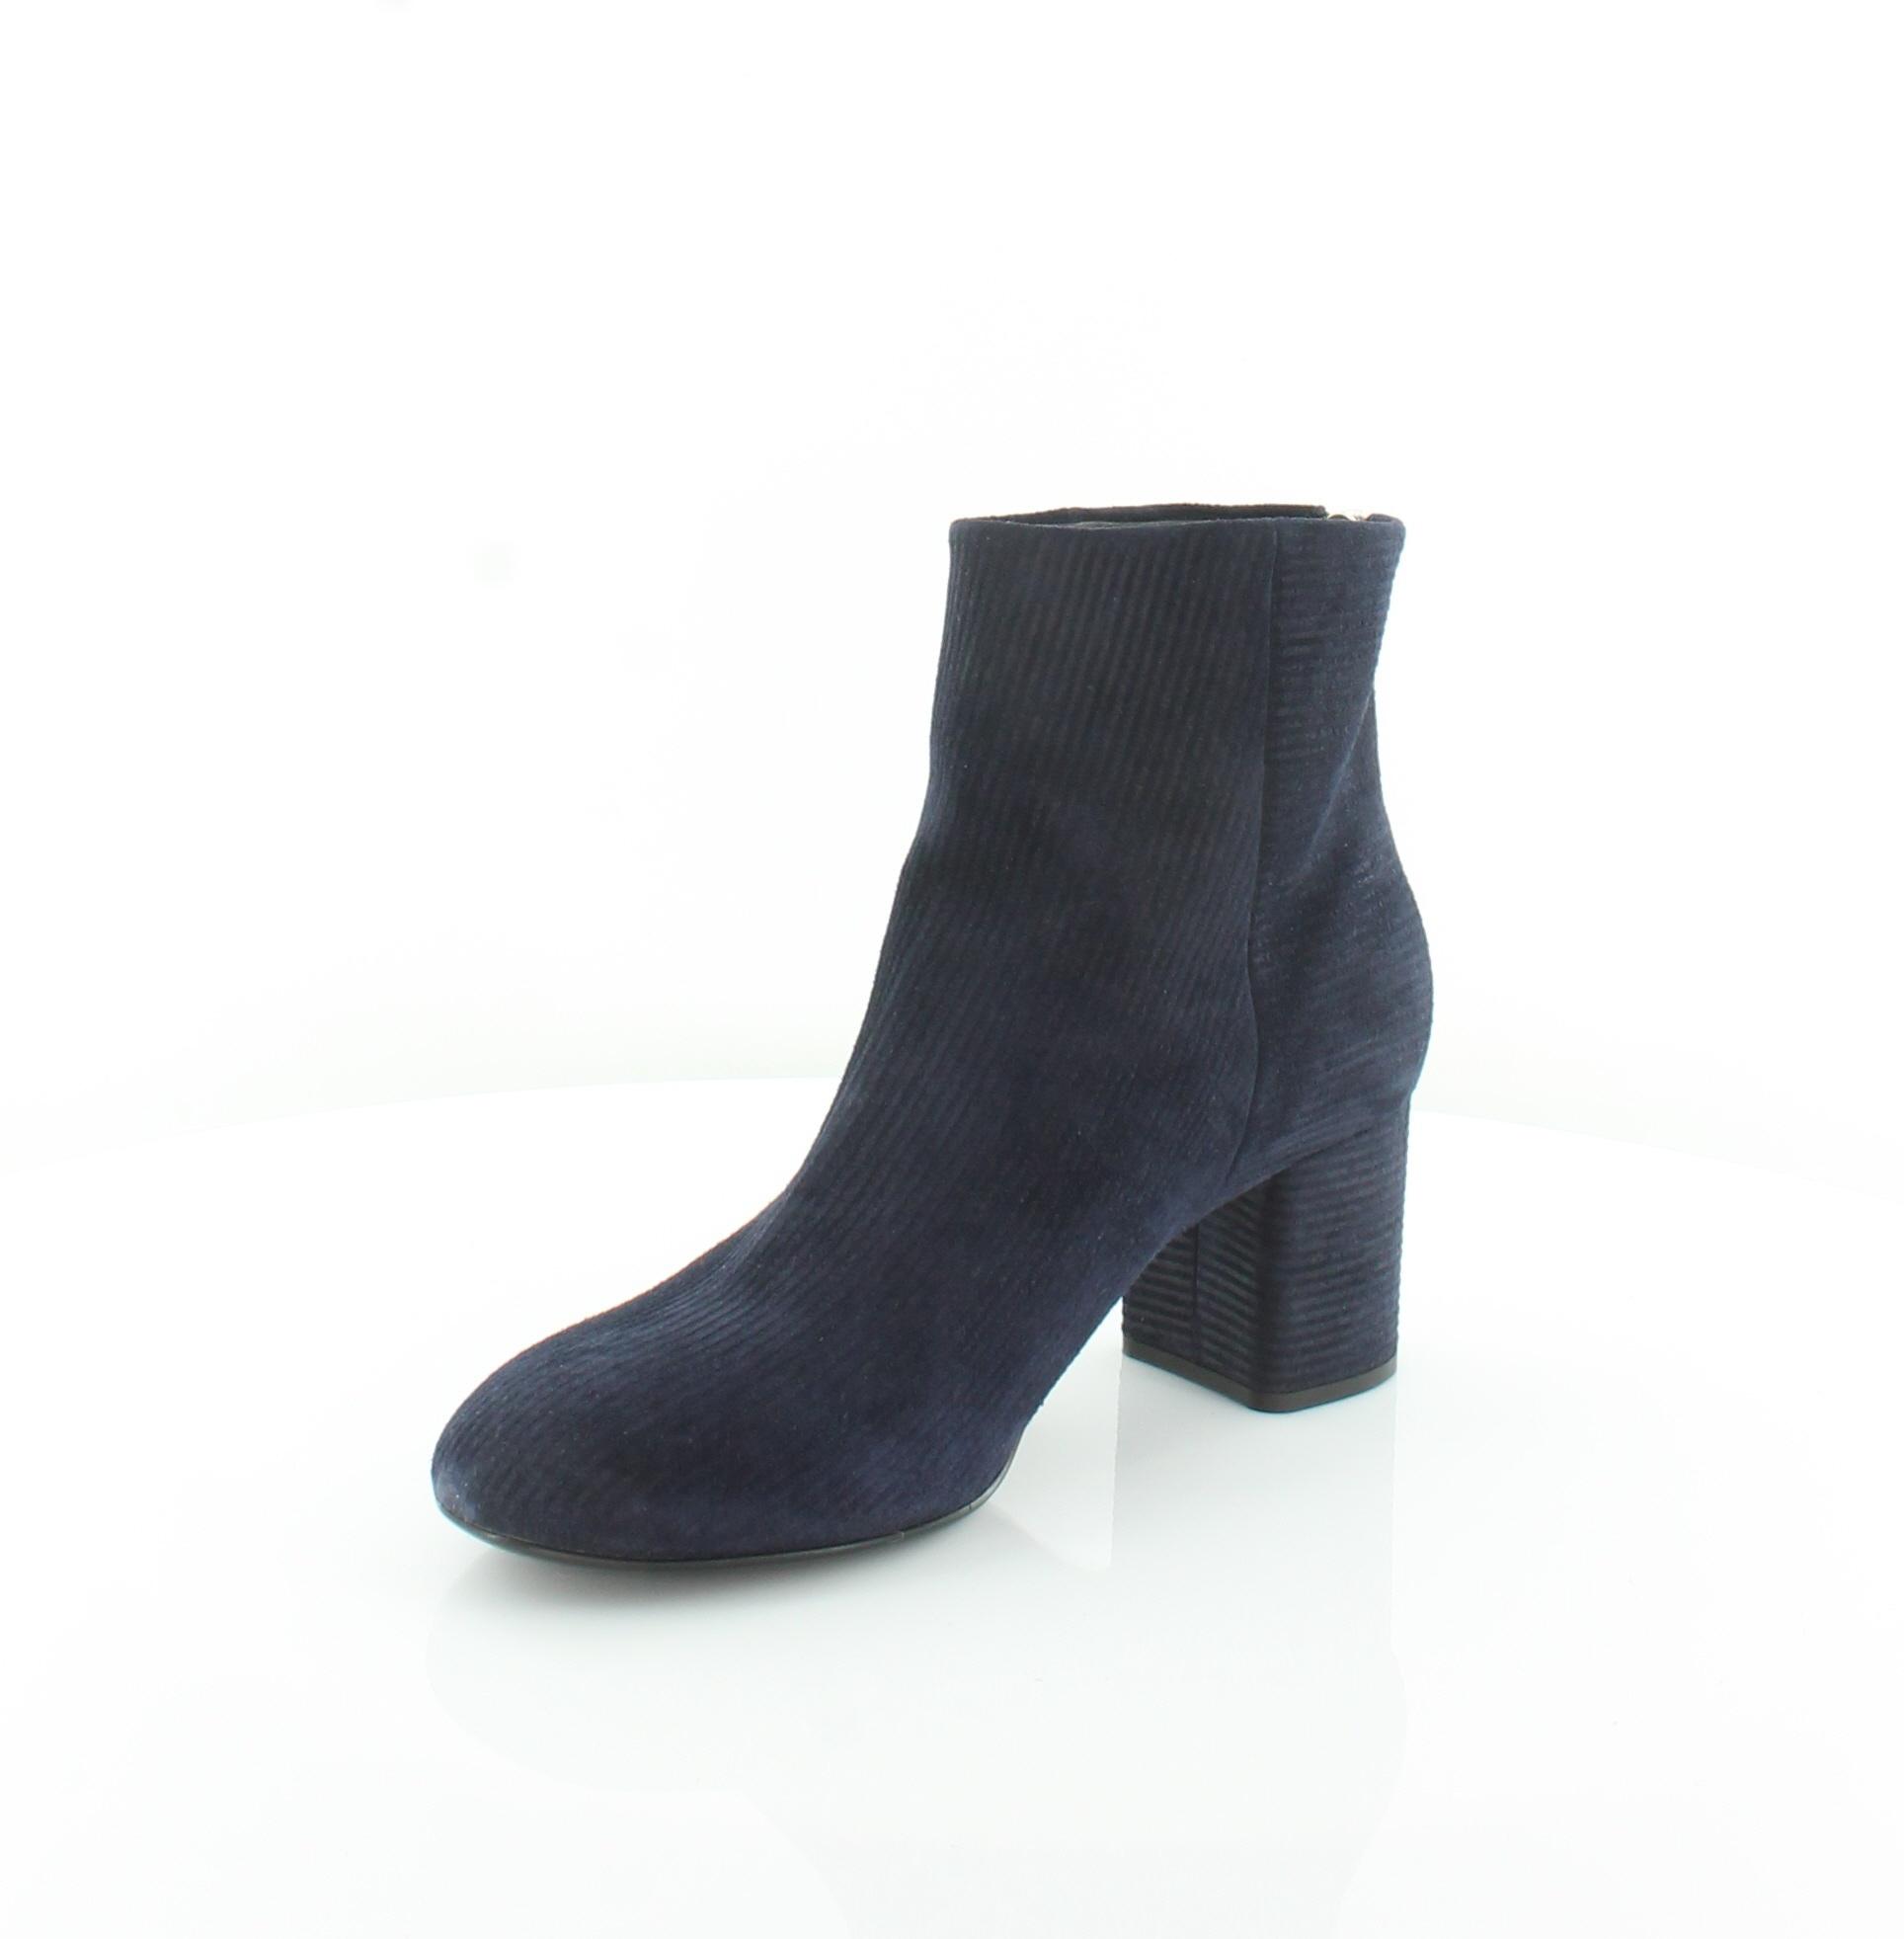 Rag & bone Drea bluee Womens shoes Size 10 10 10 M Boots MSRP  525 dc6f51